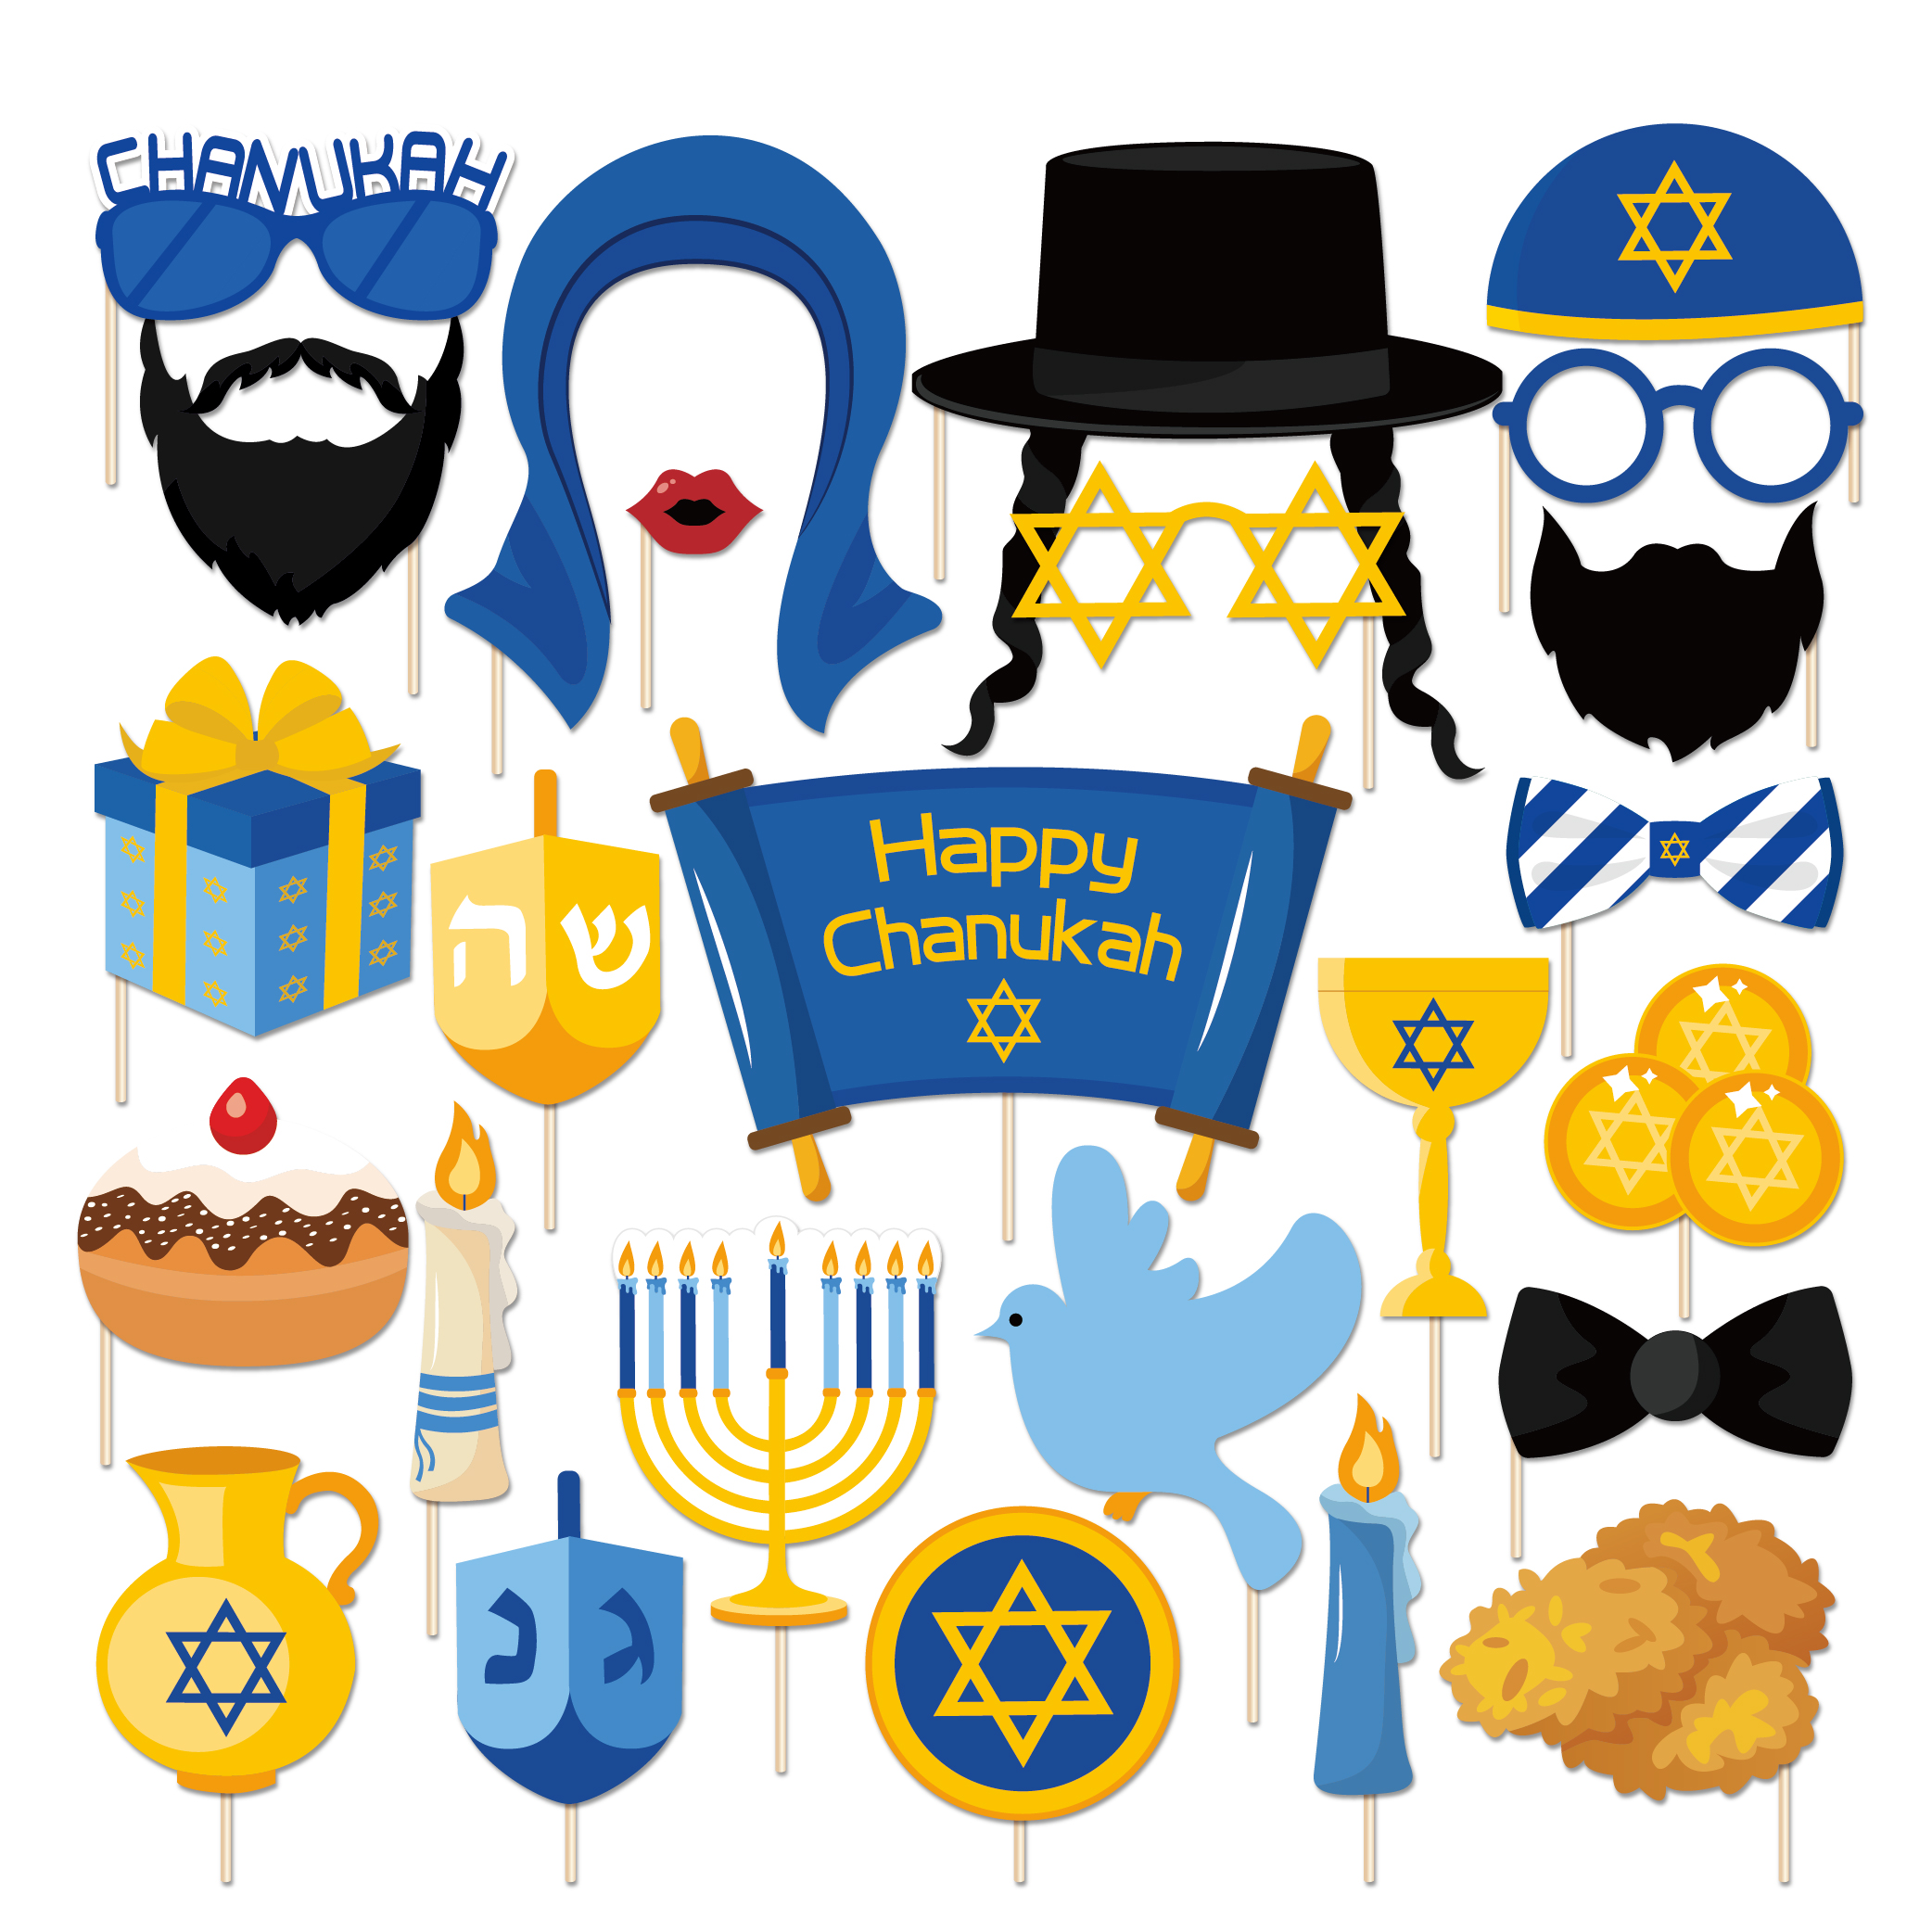 25pcs Happy Hanukkah Party Decorations DIY Photobooth Props Chanukah Theme Paper Cards Photobooth Props Party Favors Supplies